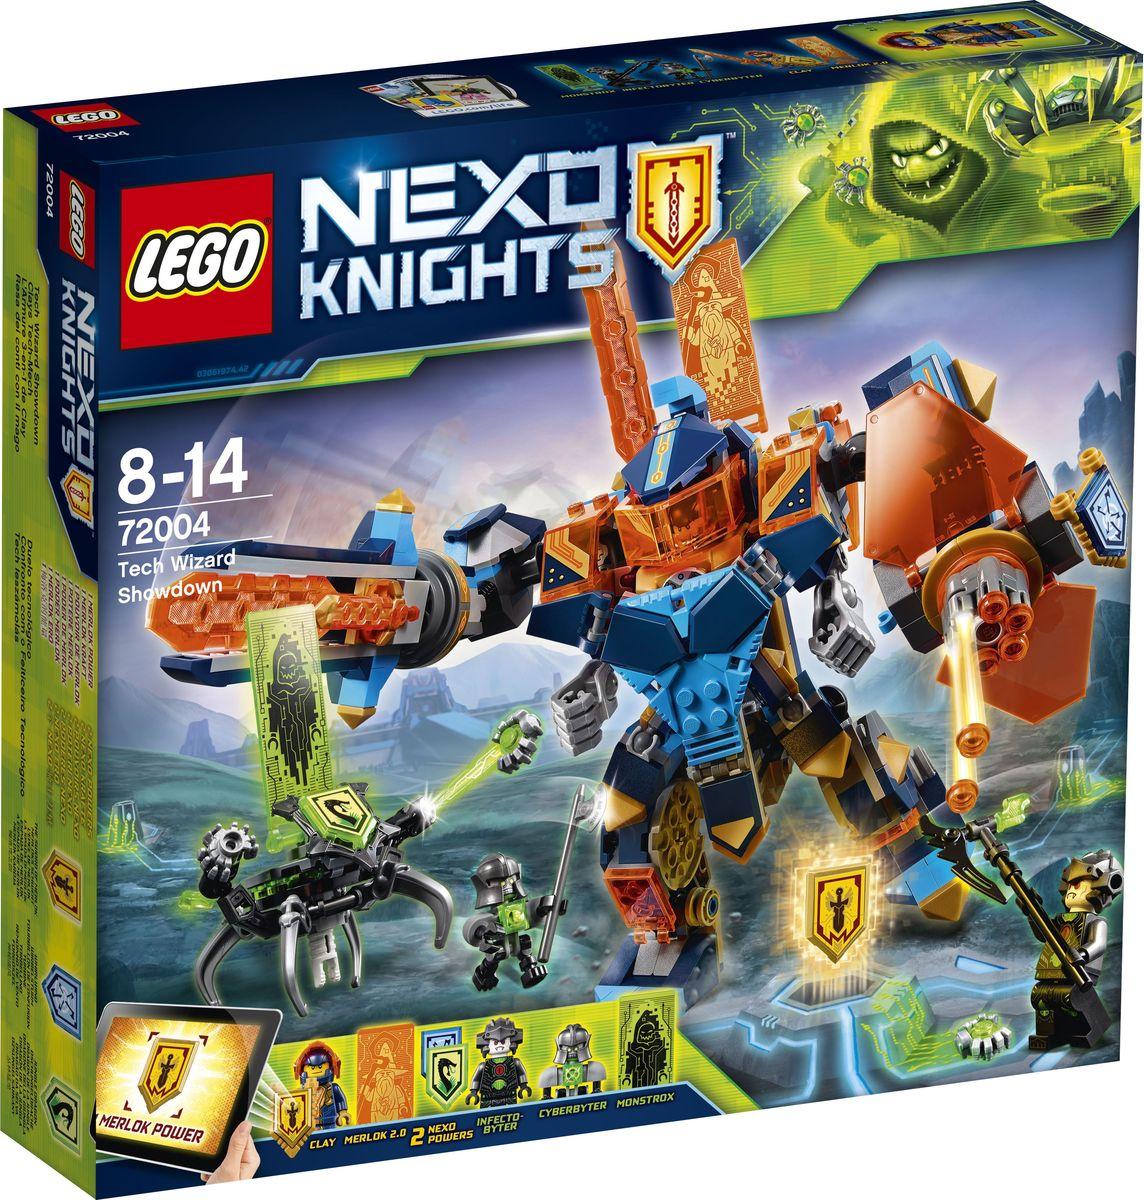 LEGO NEXO KNIGHTS Конструктор Решающая битва роботов 72004 тетради lego тетрадь 100 листов линейка lego nexo knights рыцари нексо размер 19х24 7 см